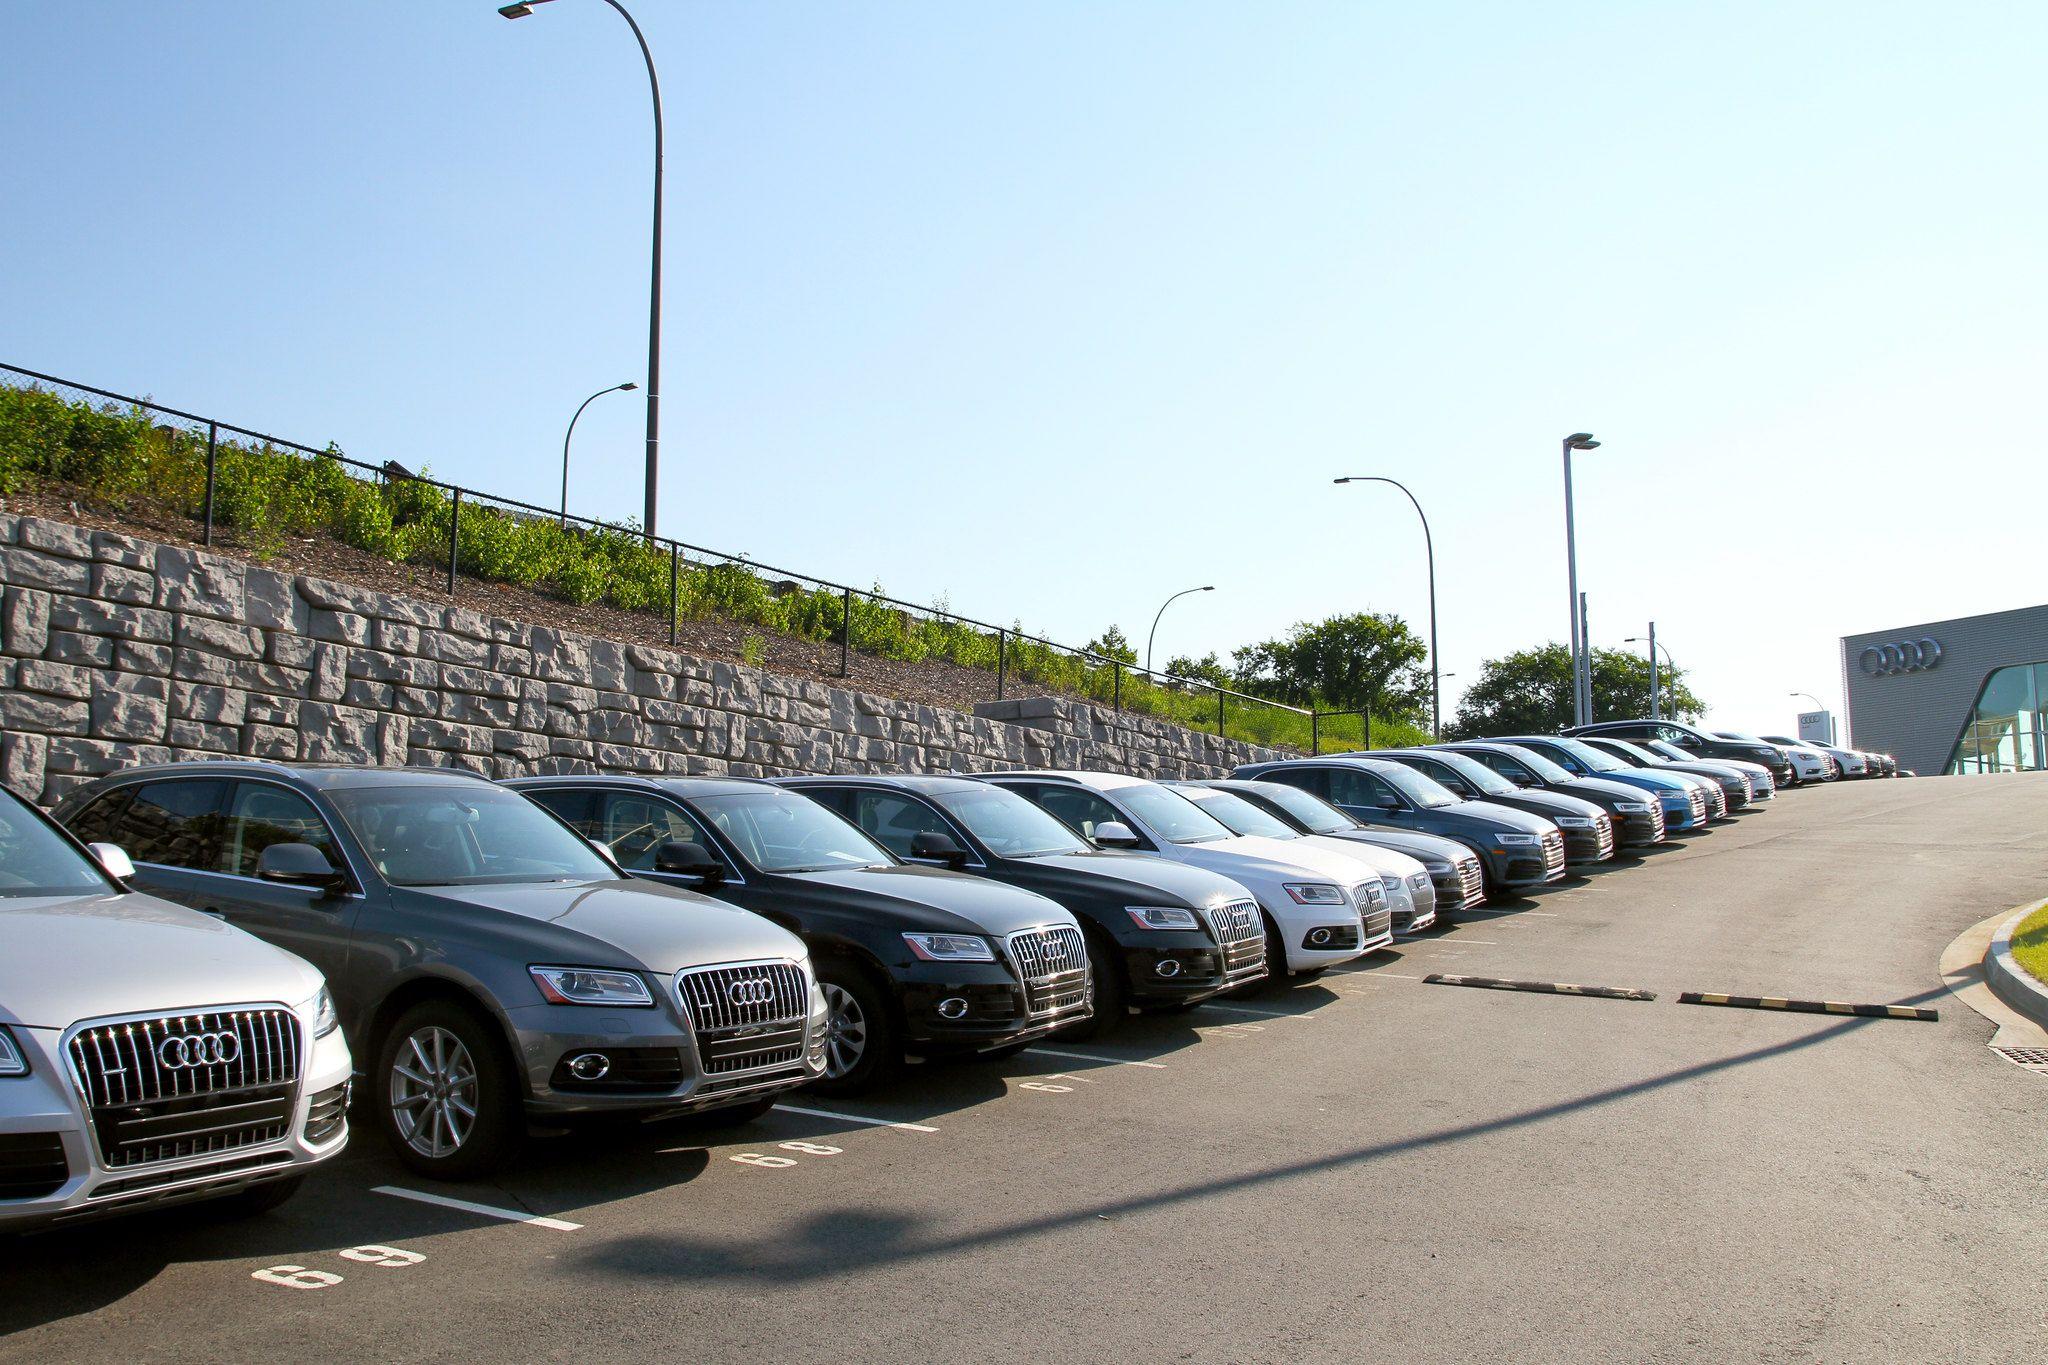 RR_Case-174_Duracast_Audi-Dealership_1.jpg